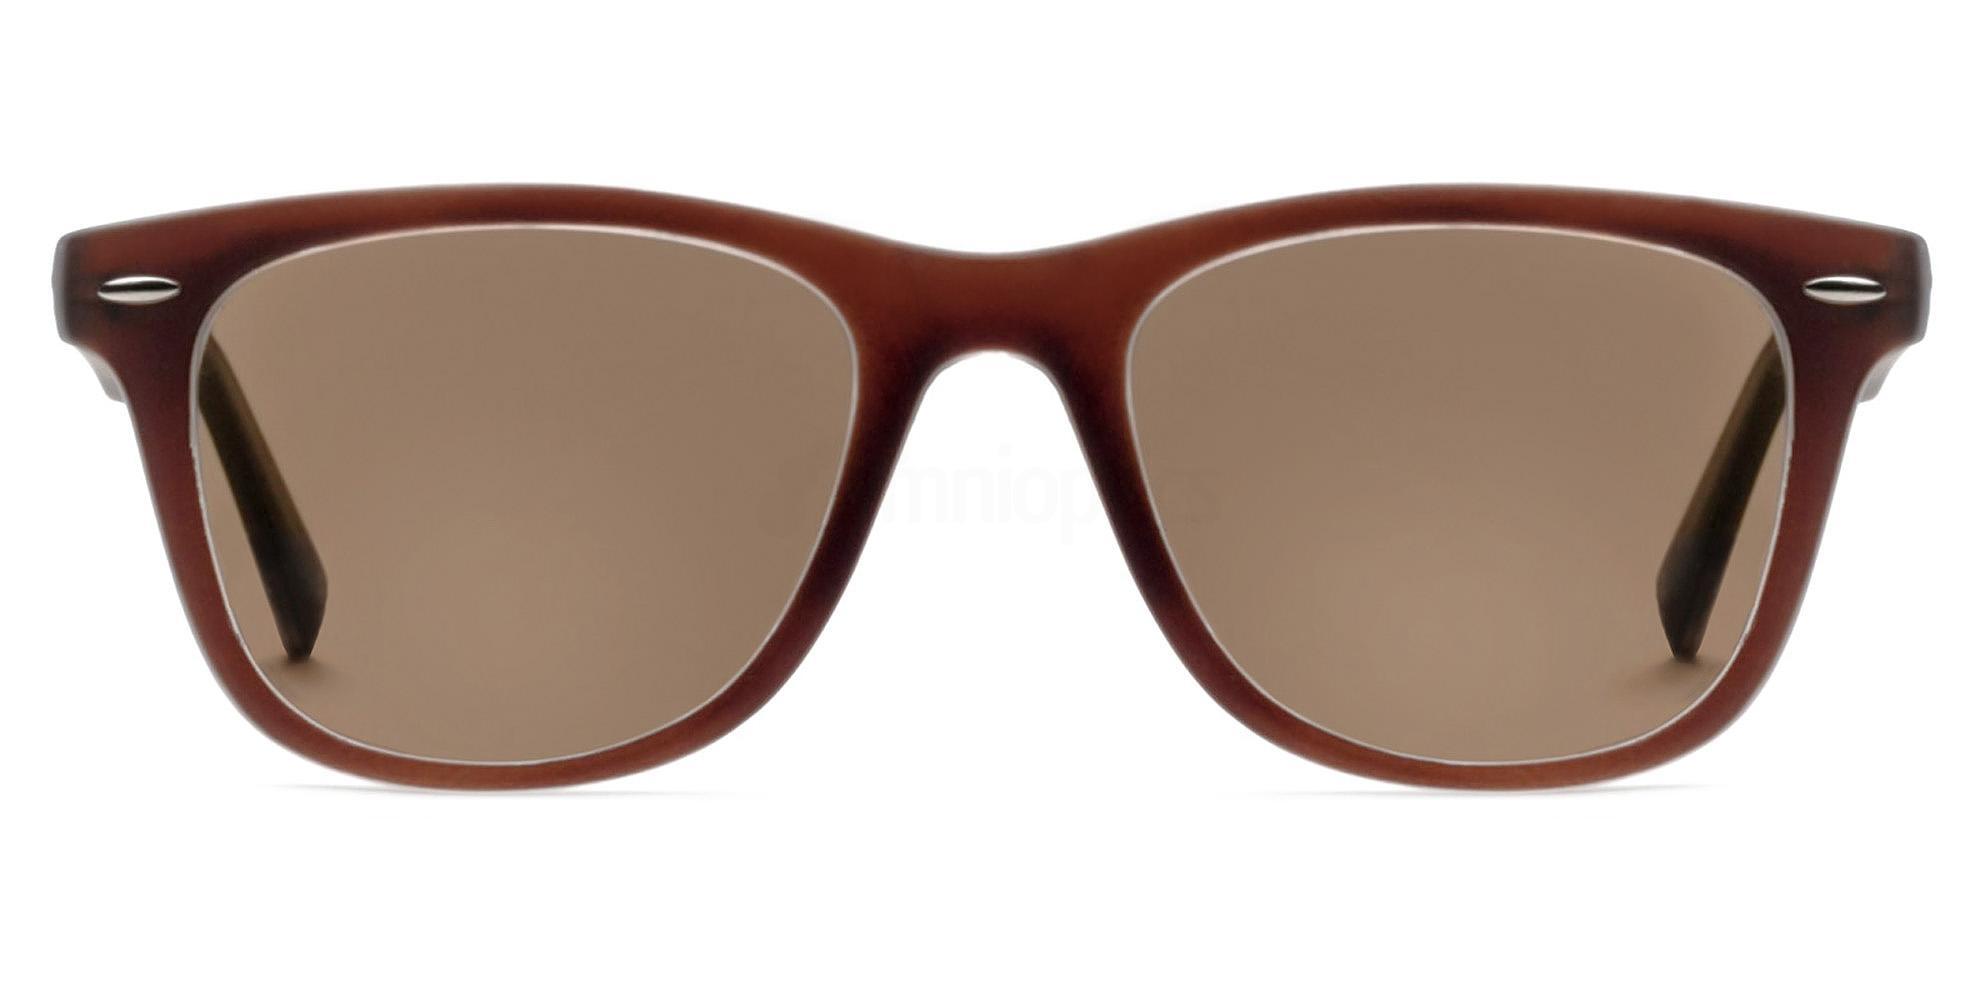 C8 8121 - Brown (Sunglasses) , Savannah